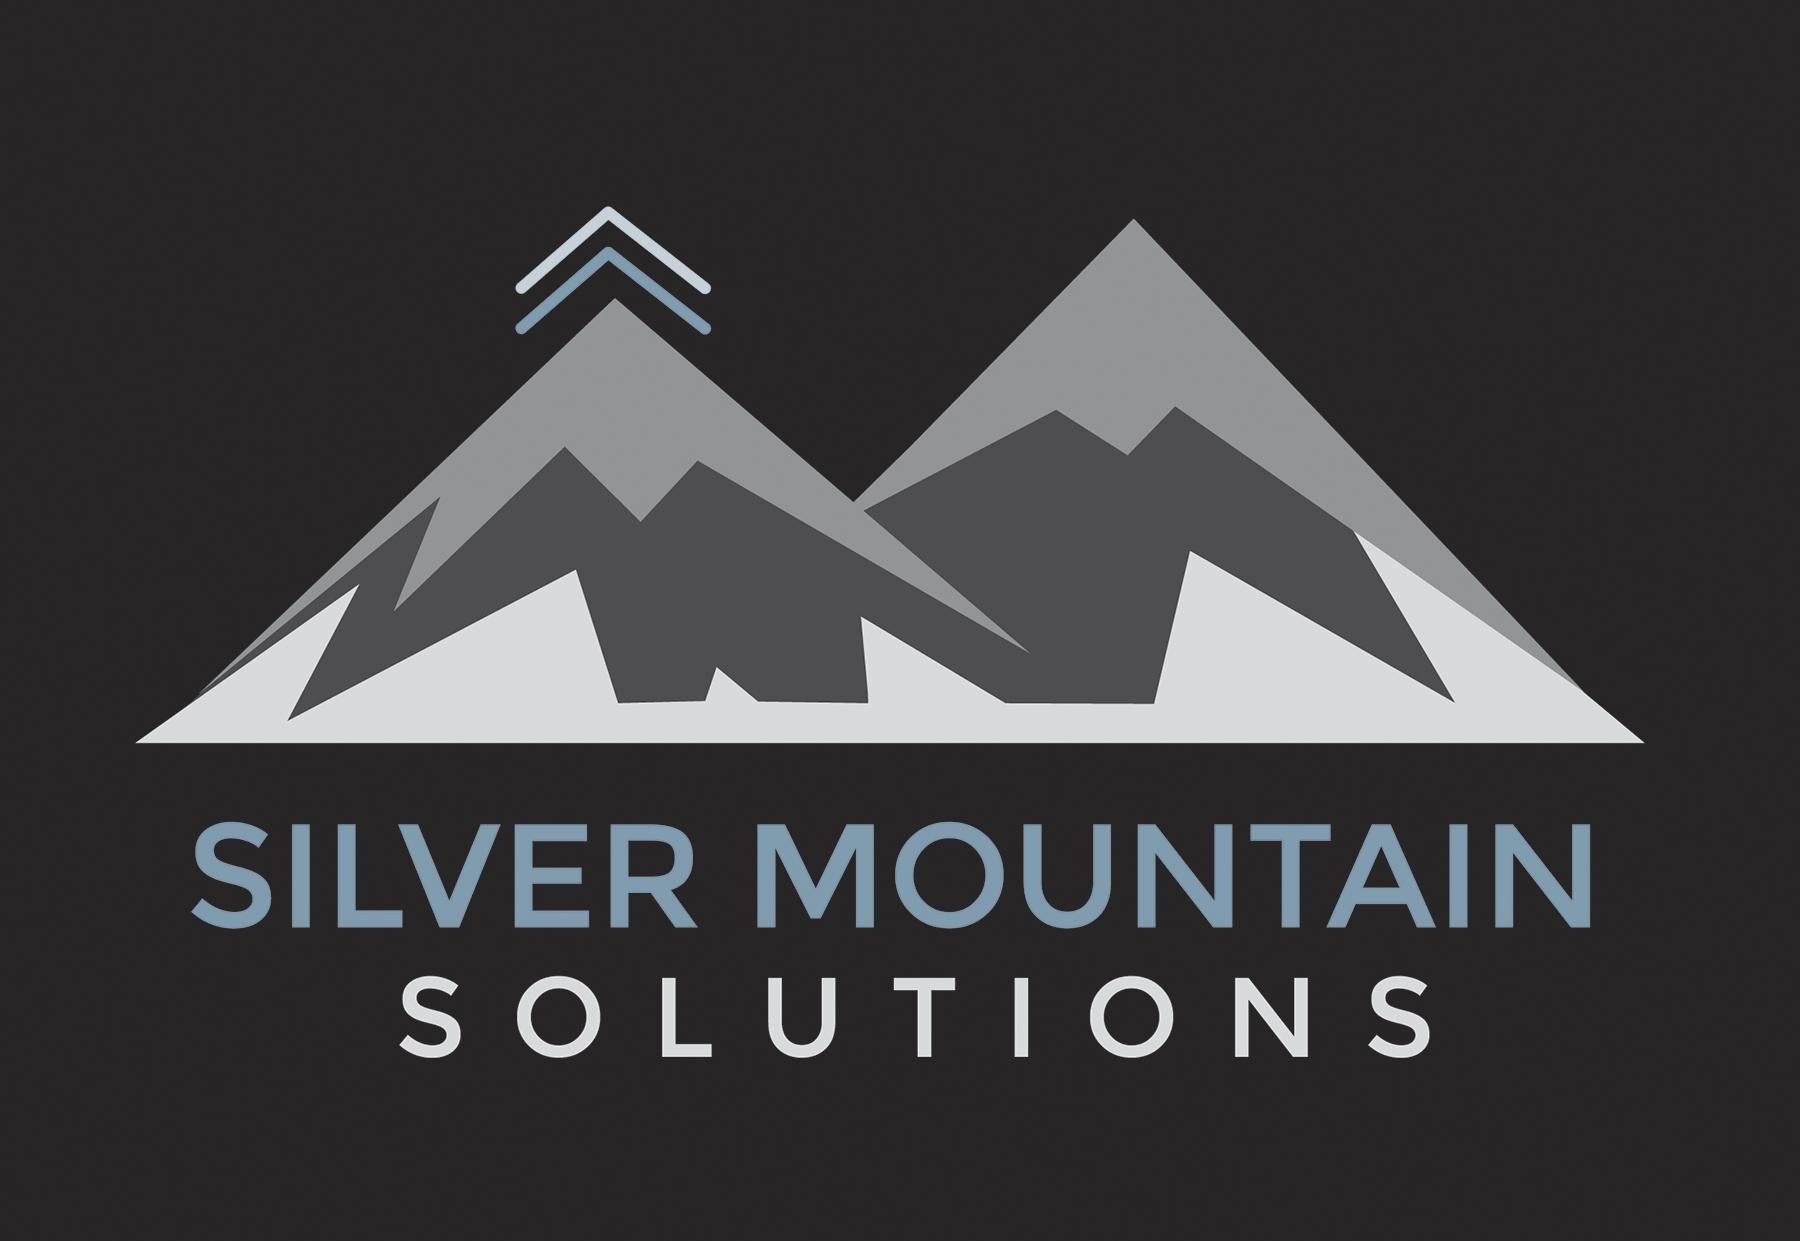 silvermountainsolutions.com